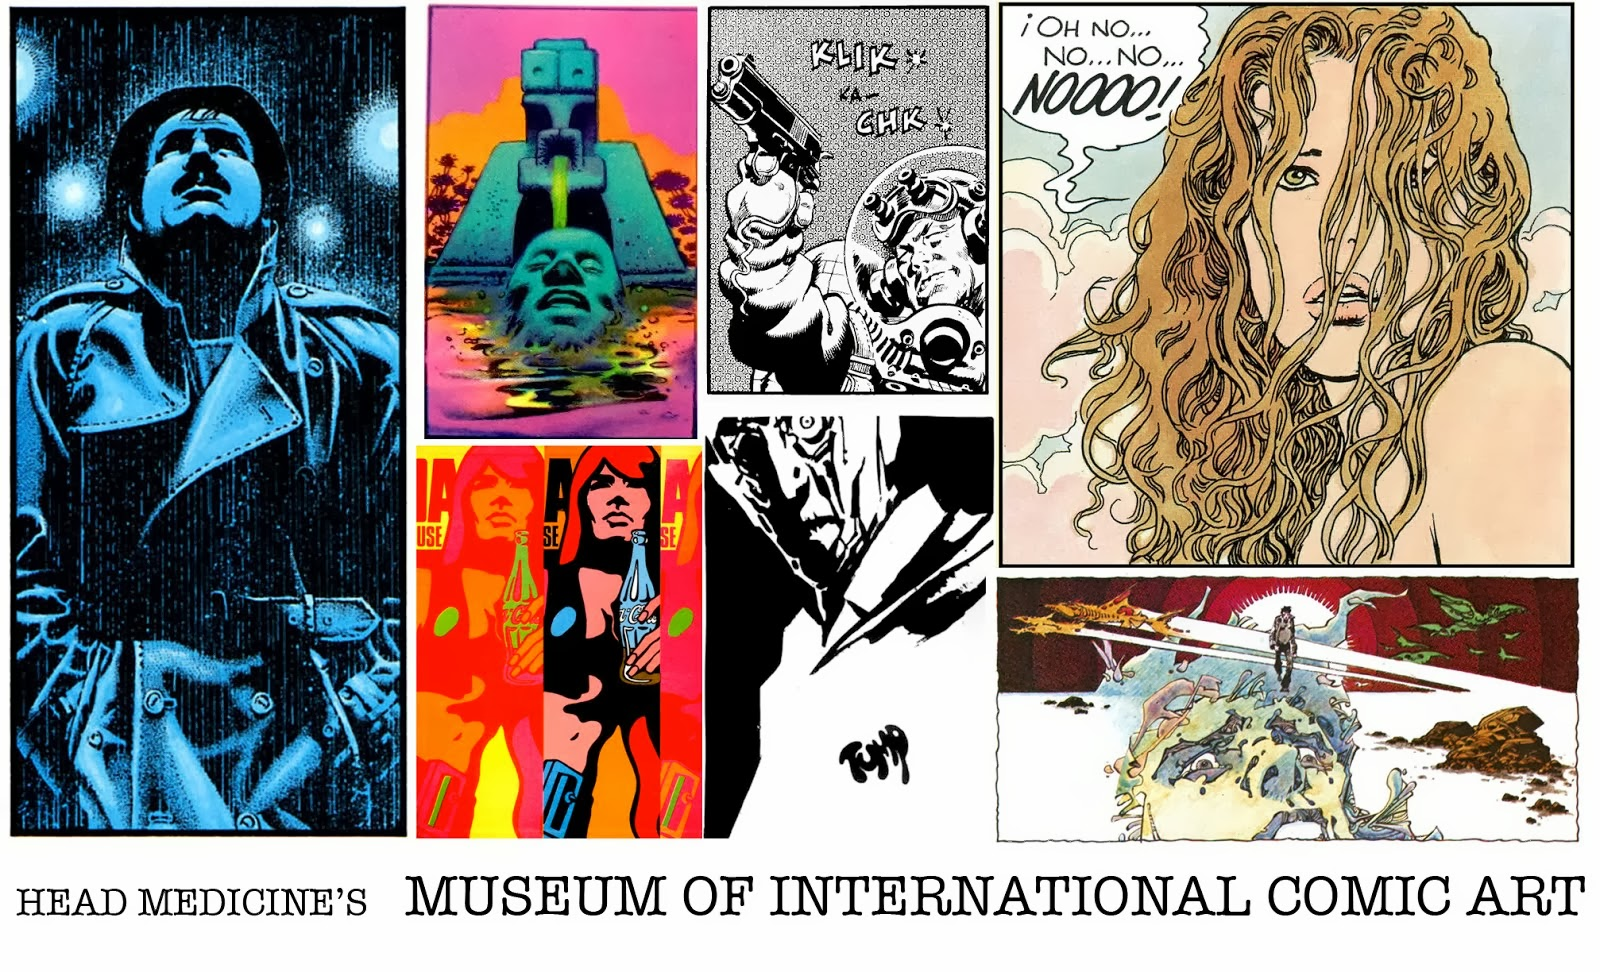 Head Medicine's Museum of International Comic Art